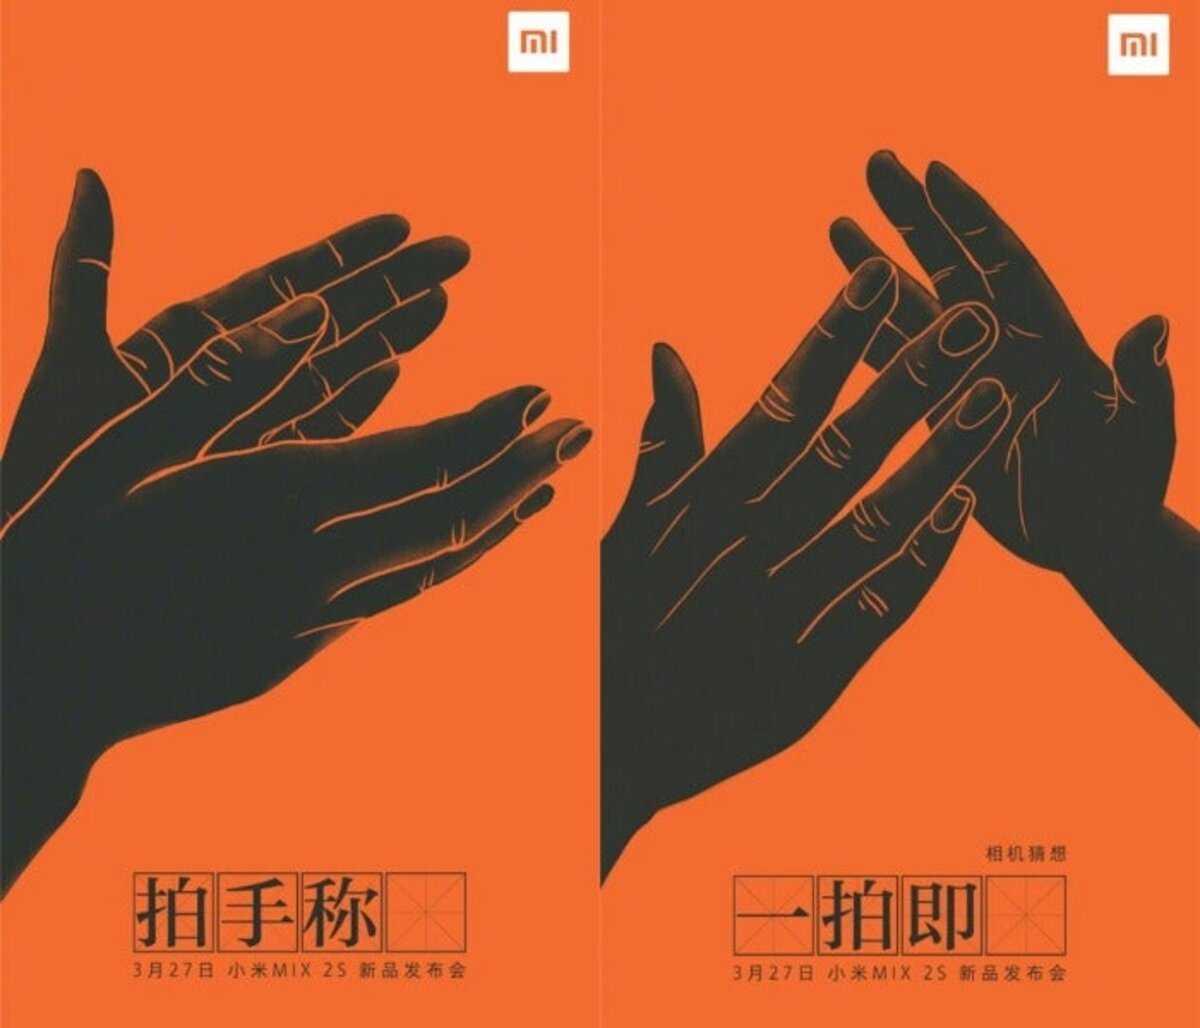 Affiche Xiaomi Mi Mix 2s